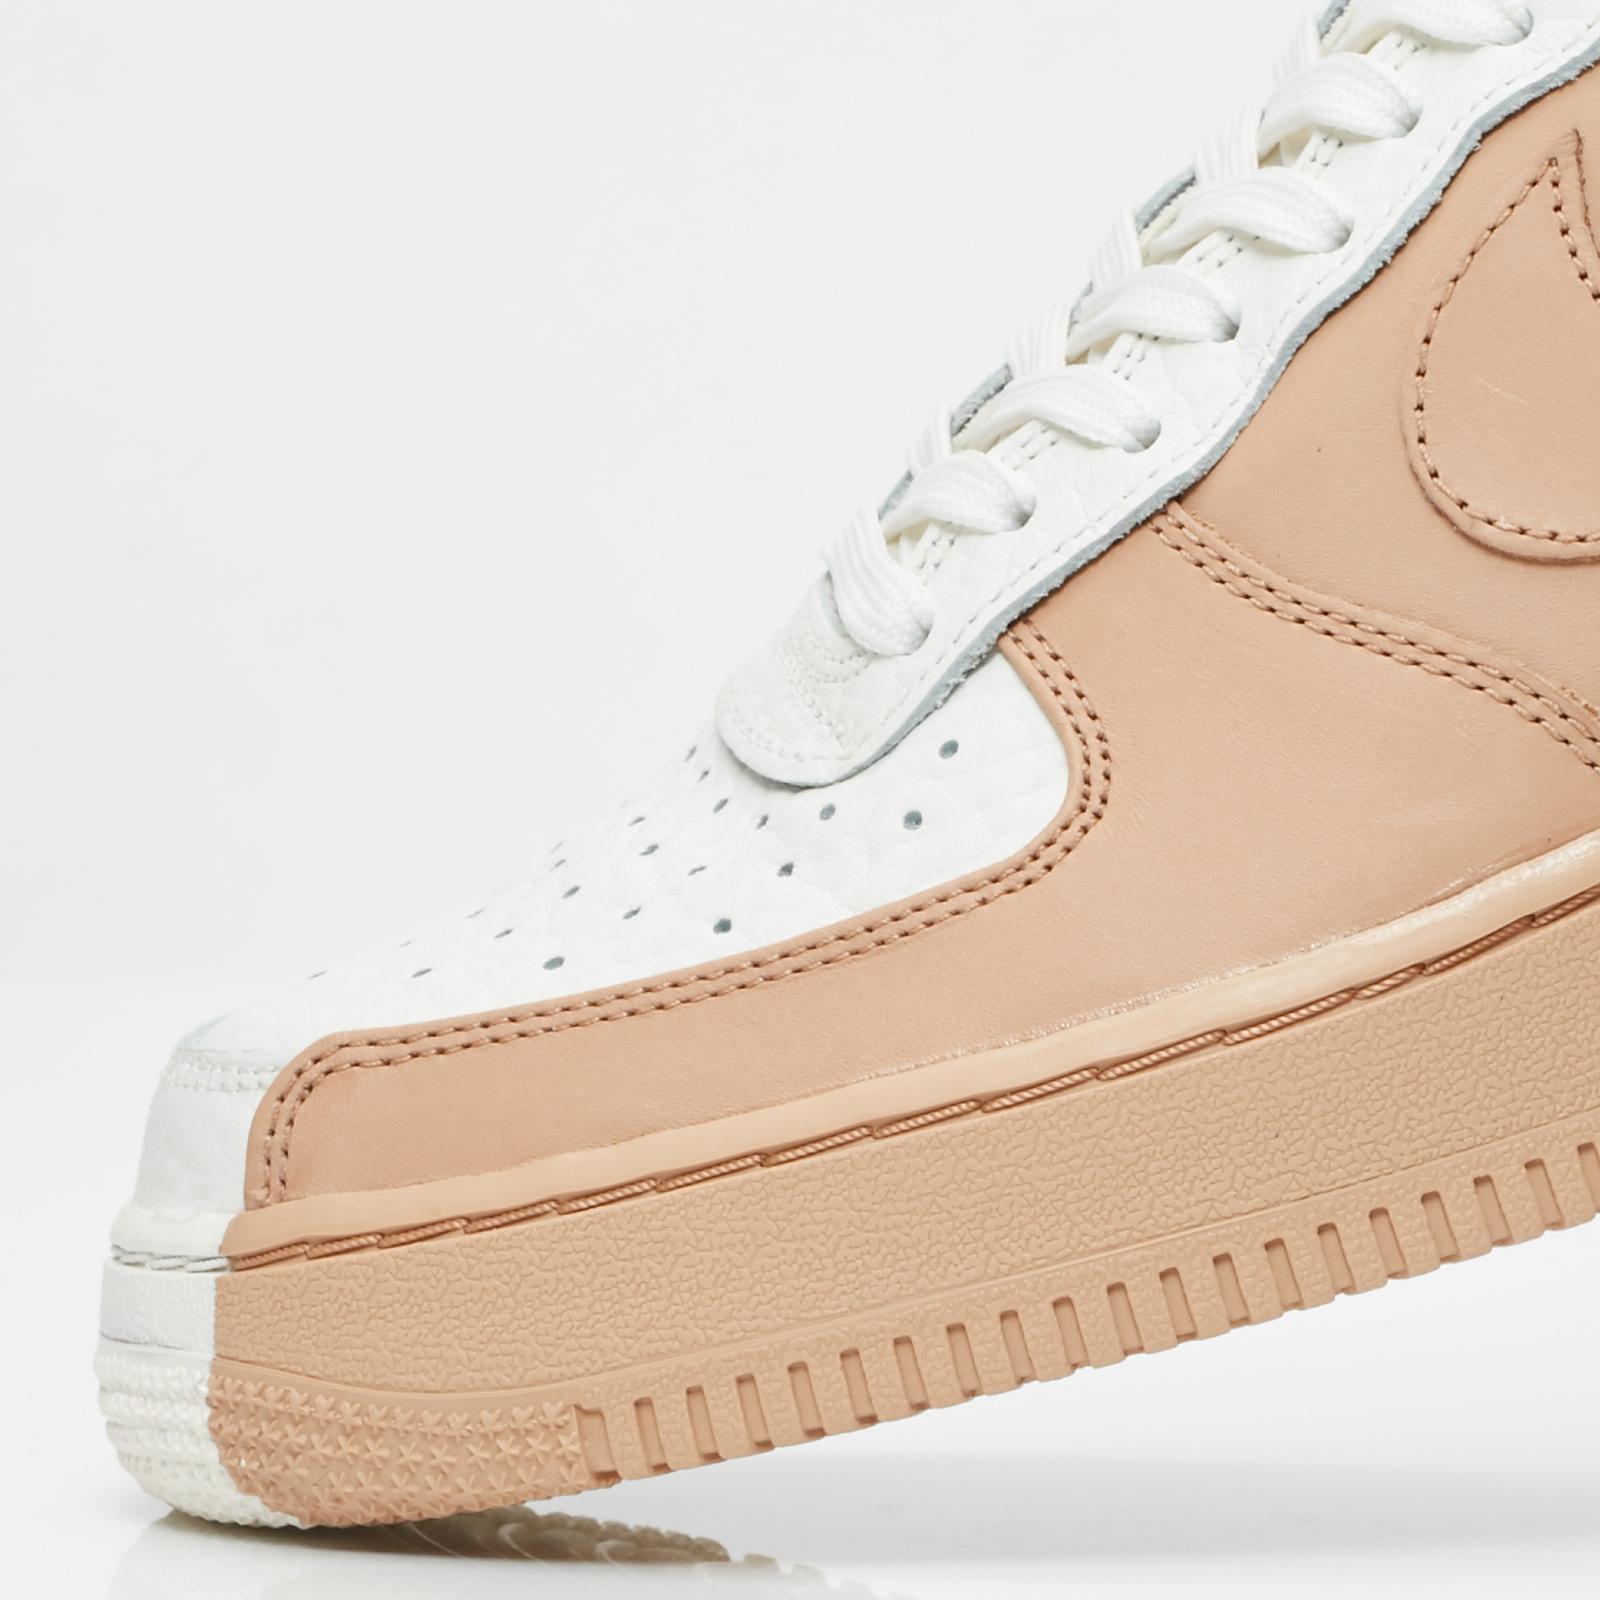 huge selection of e1c88 bc639 Nike Sportswear Air Force 1 07 Premium - 6. Close